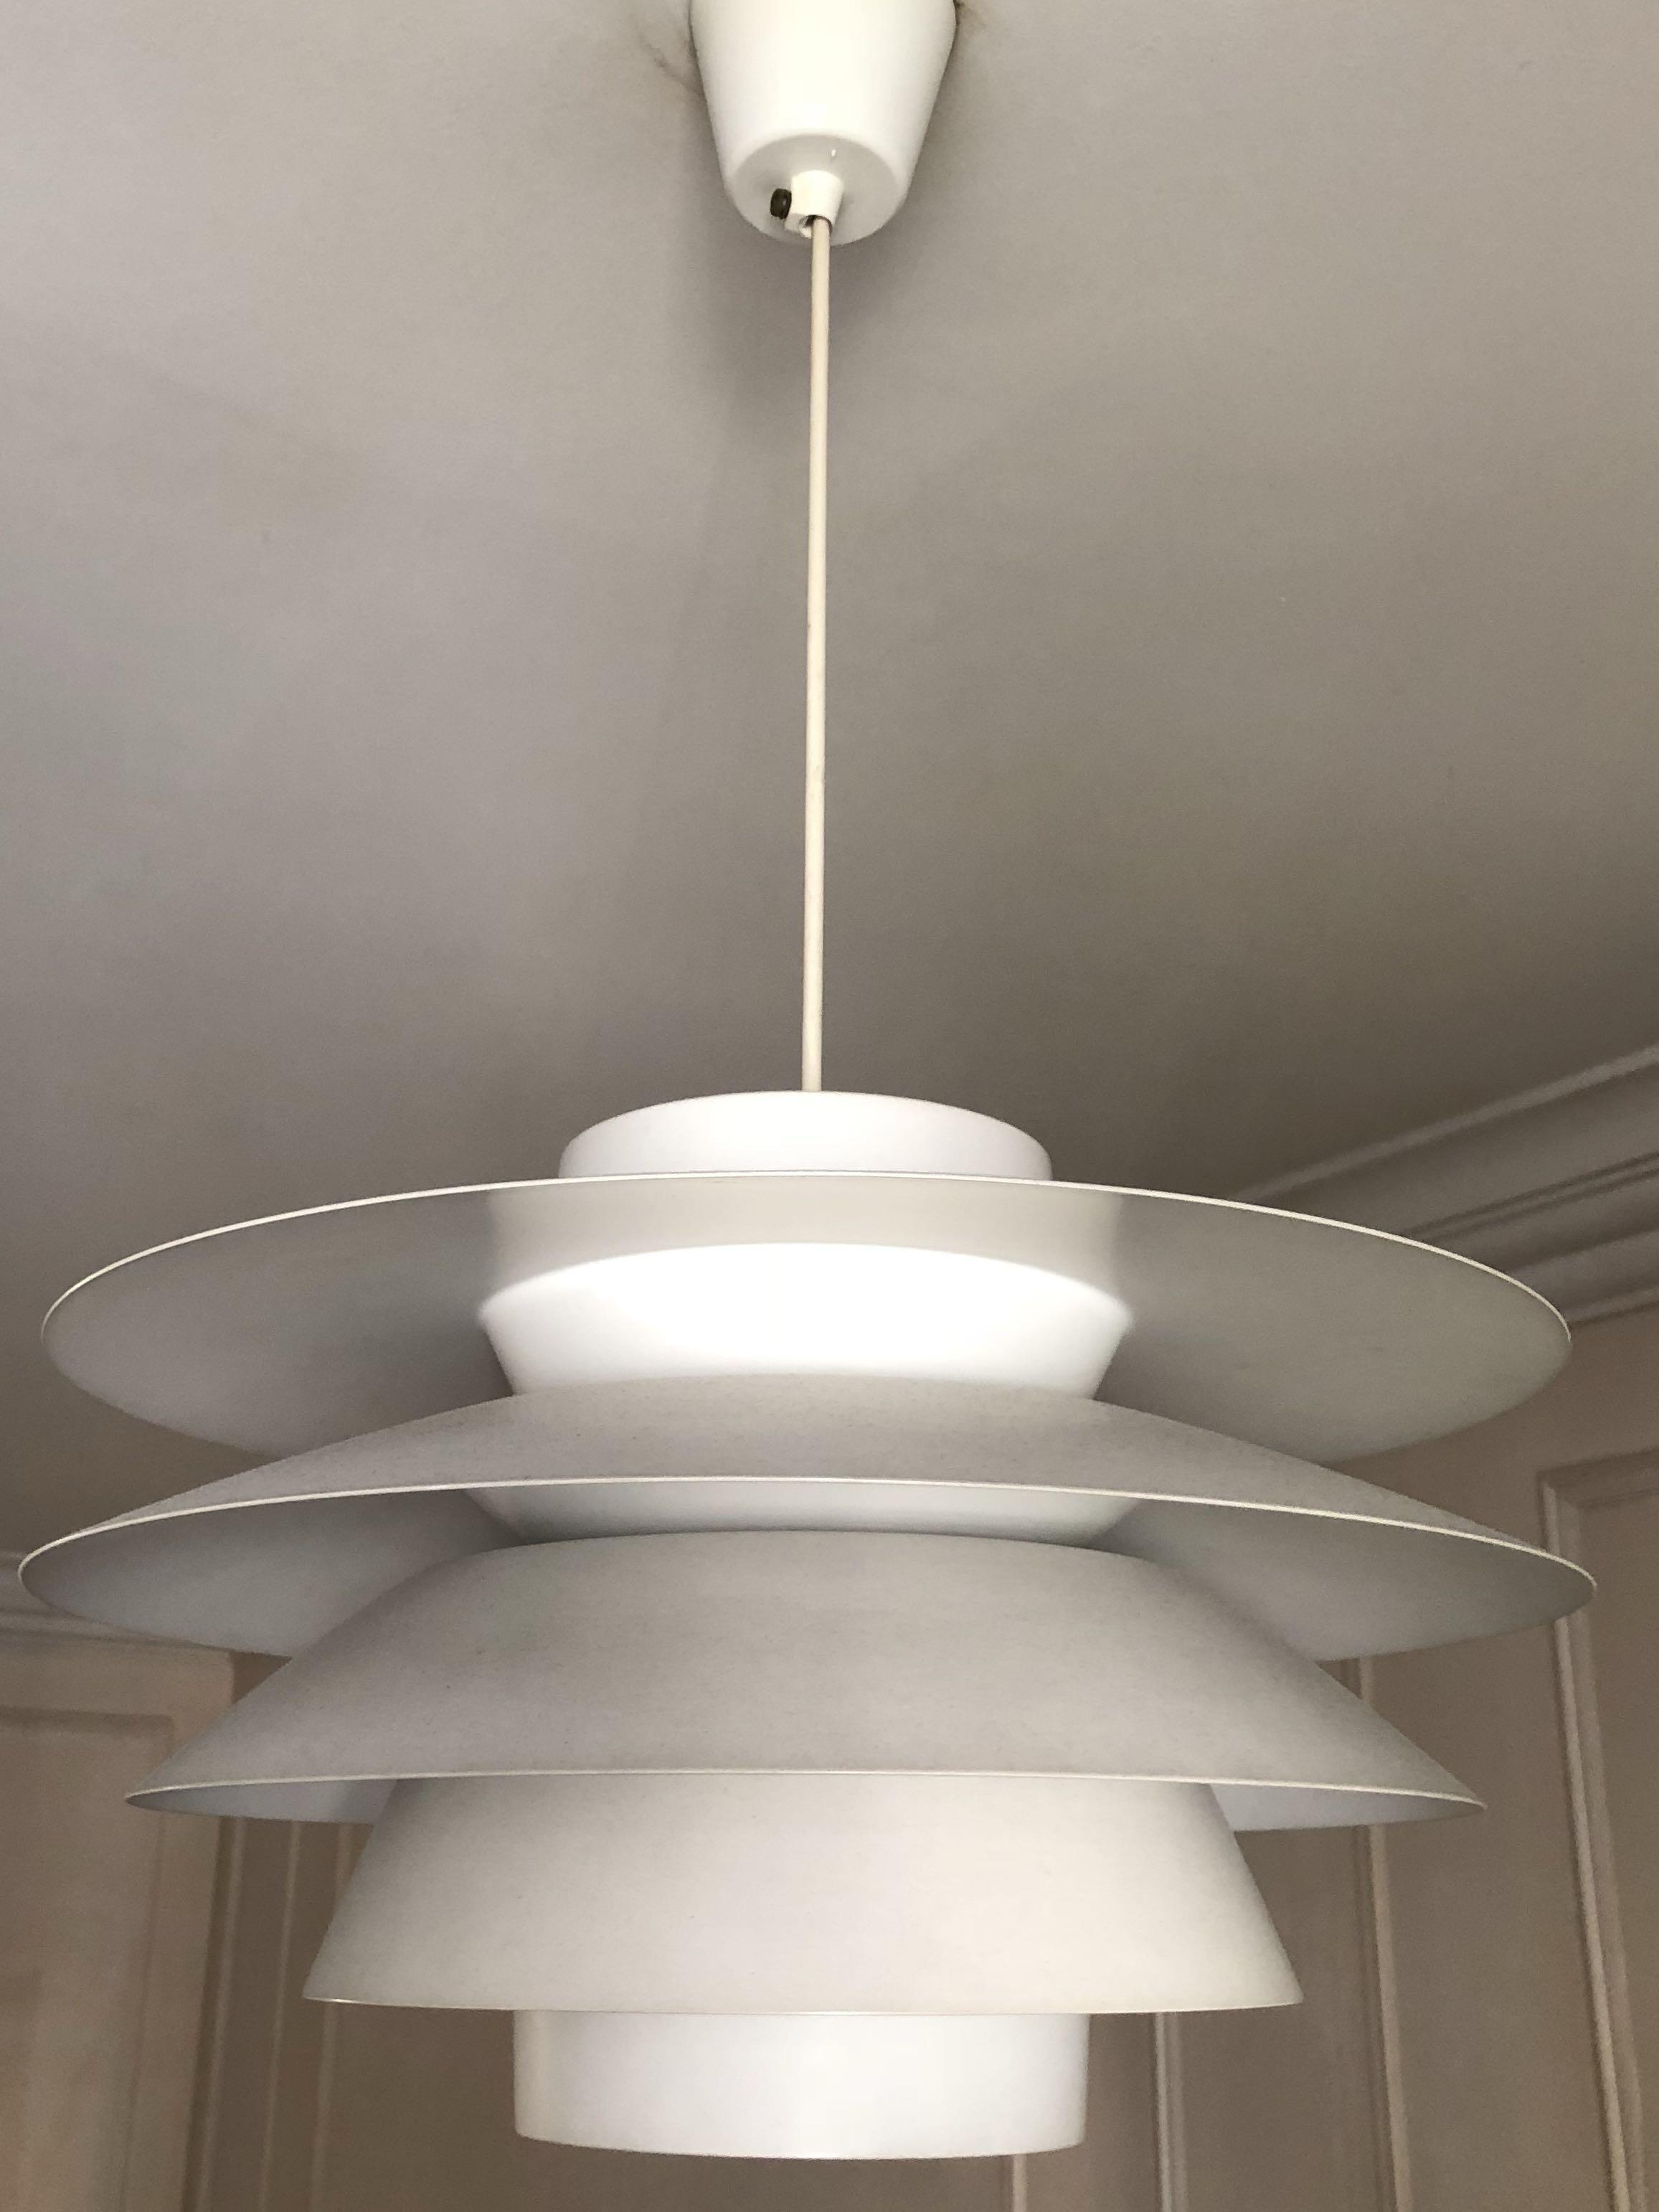 ceiling lights upshine lighting light products led